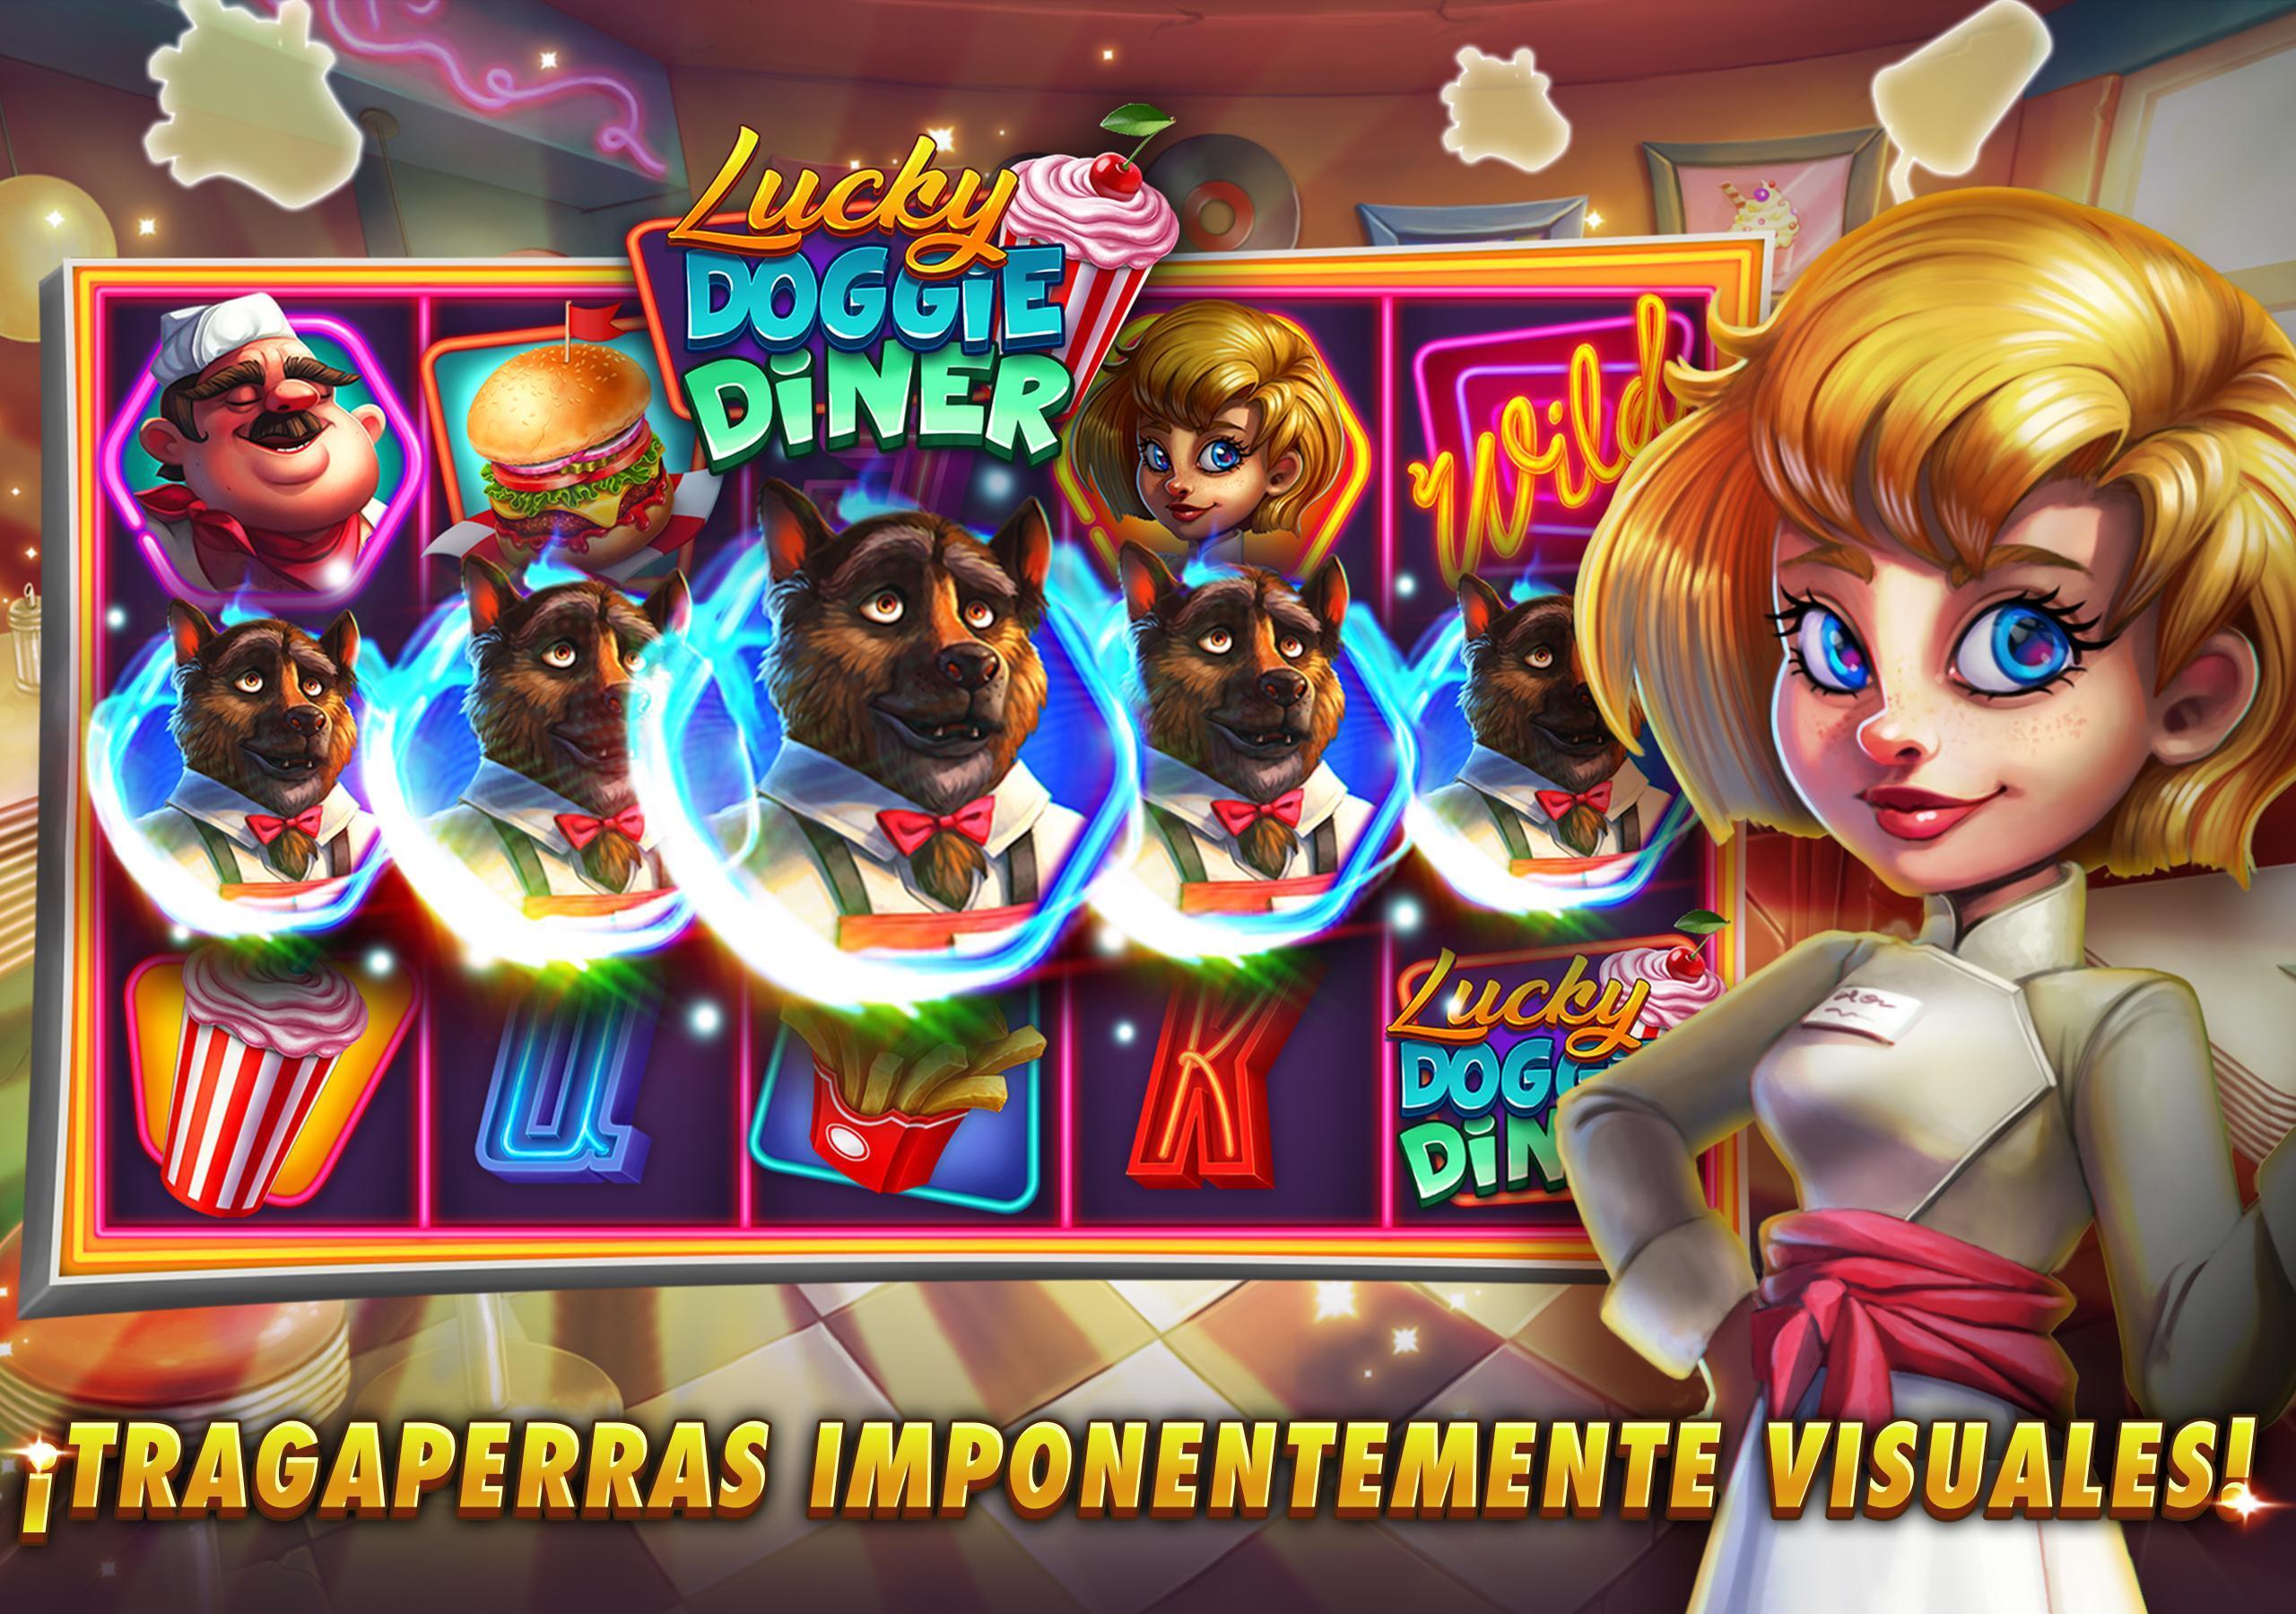 Huuuge casino download laptop